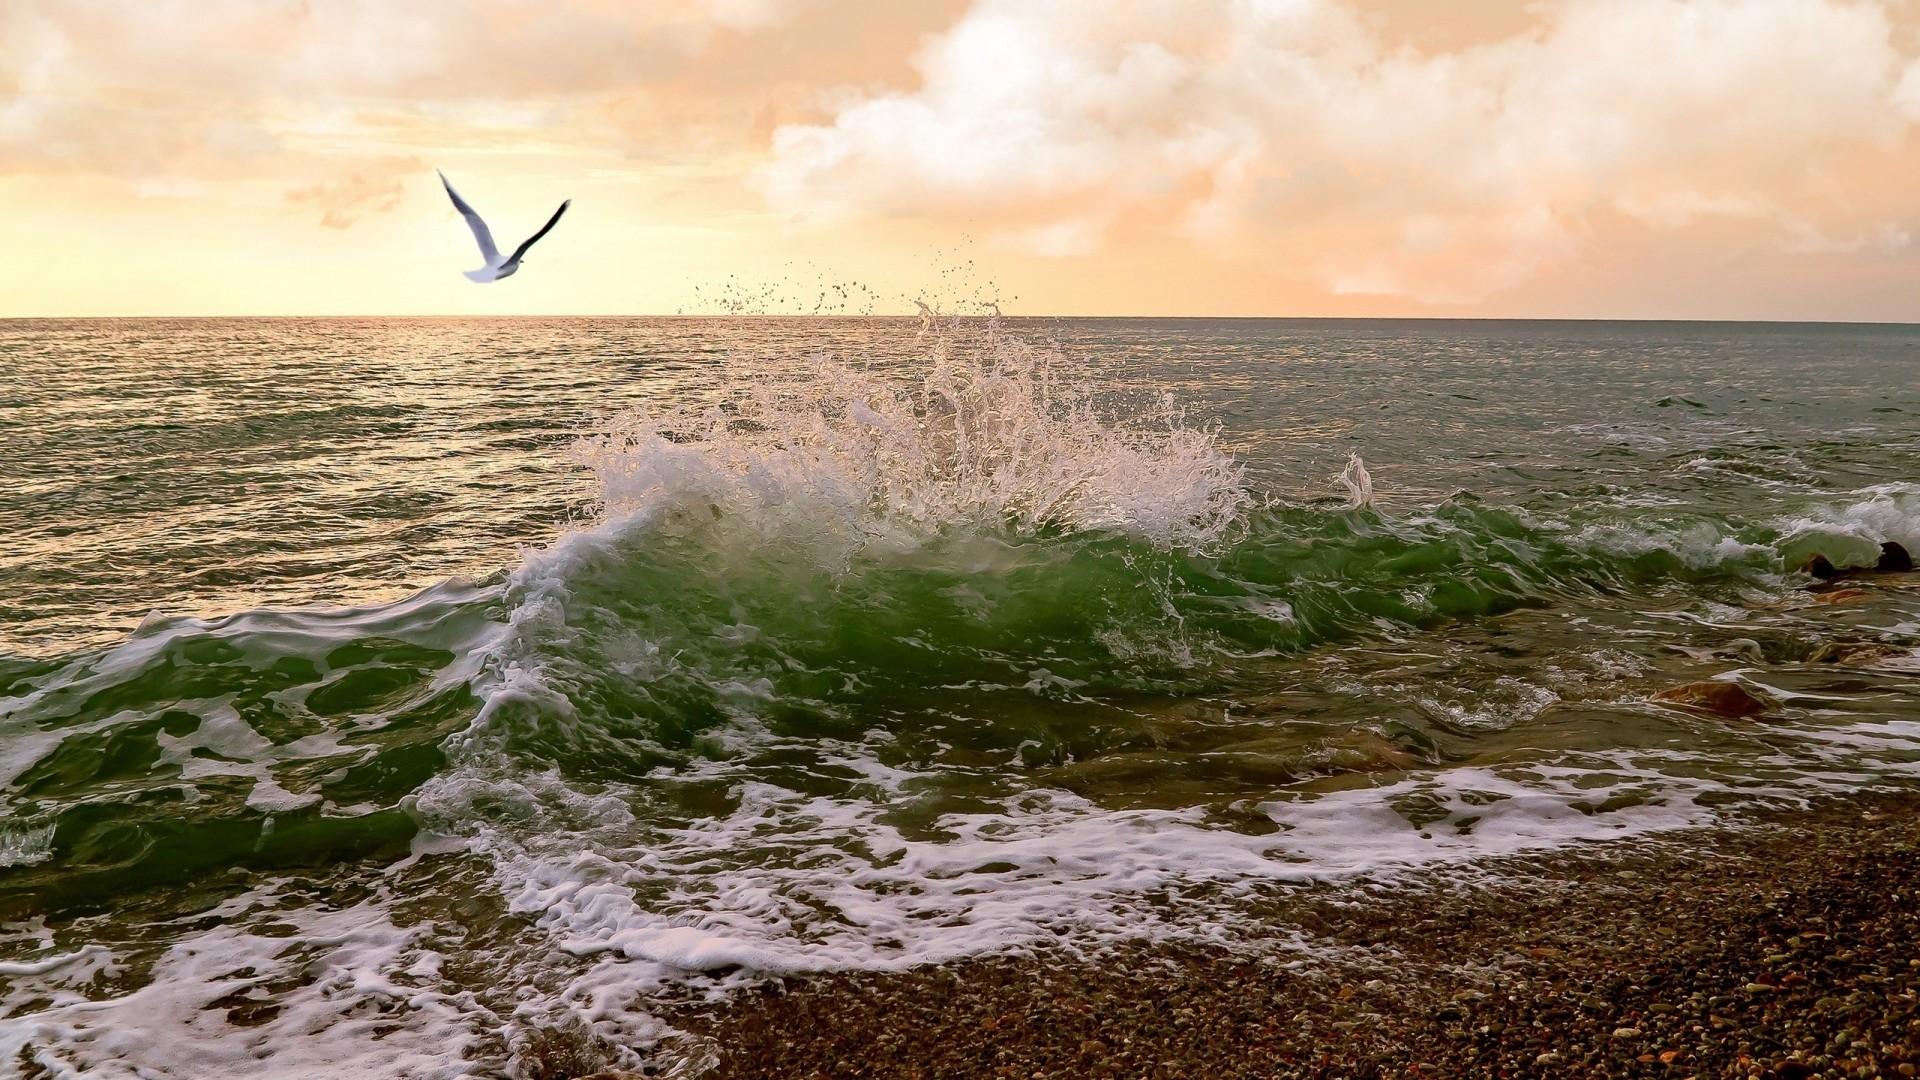 ocean landscapes nature waves seagulls sea shorelines sea